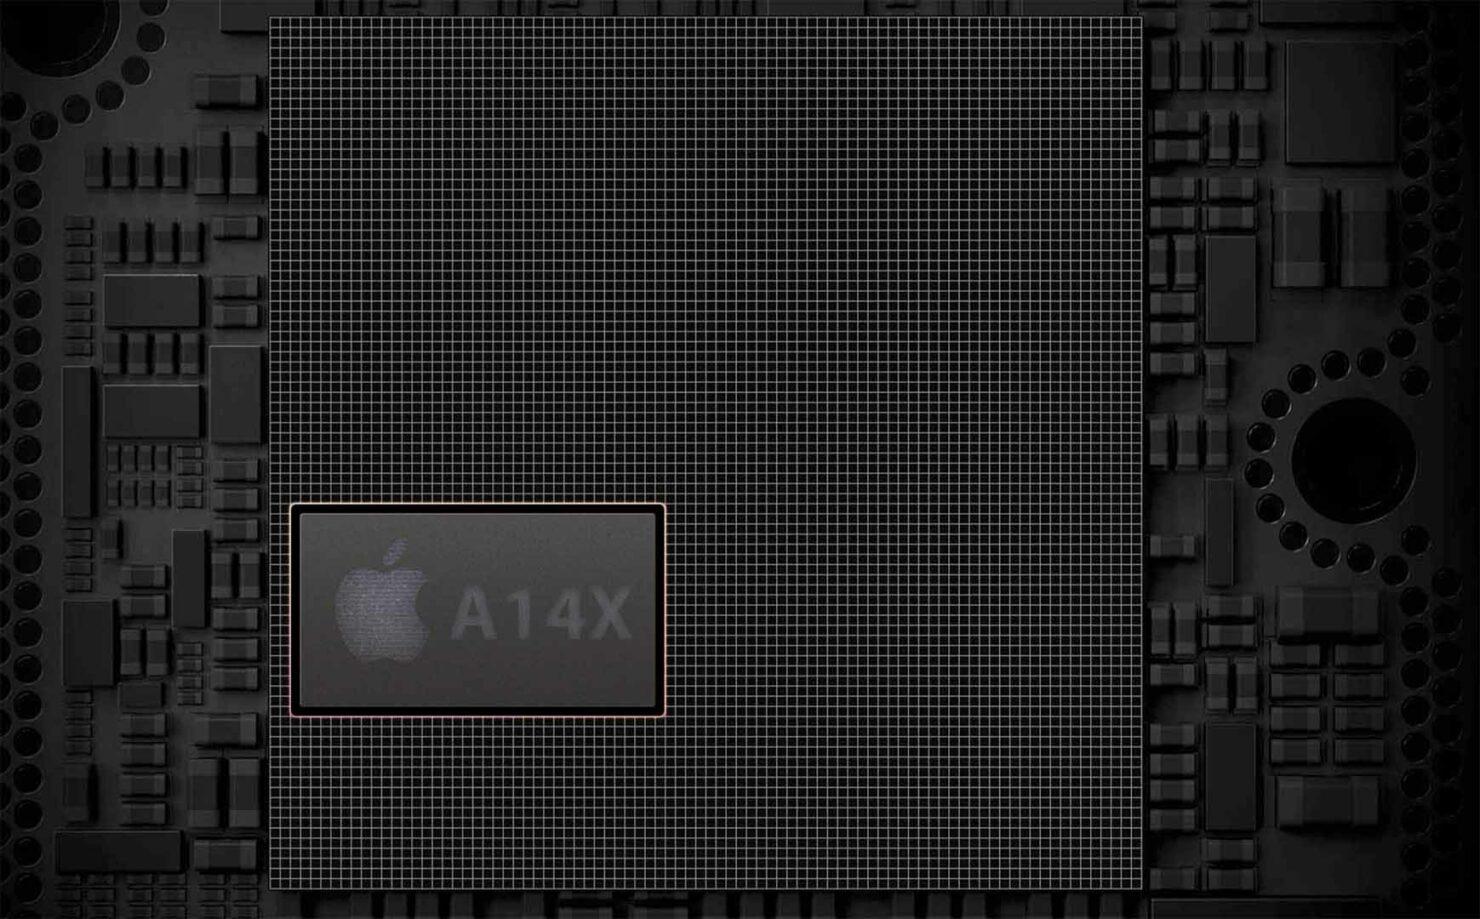 A14X仿生多强?估计性能接近i9-9980HK的16英寸MBP